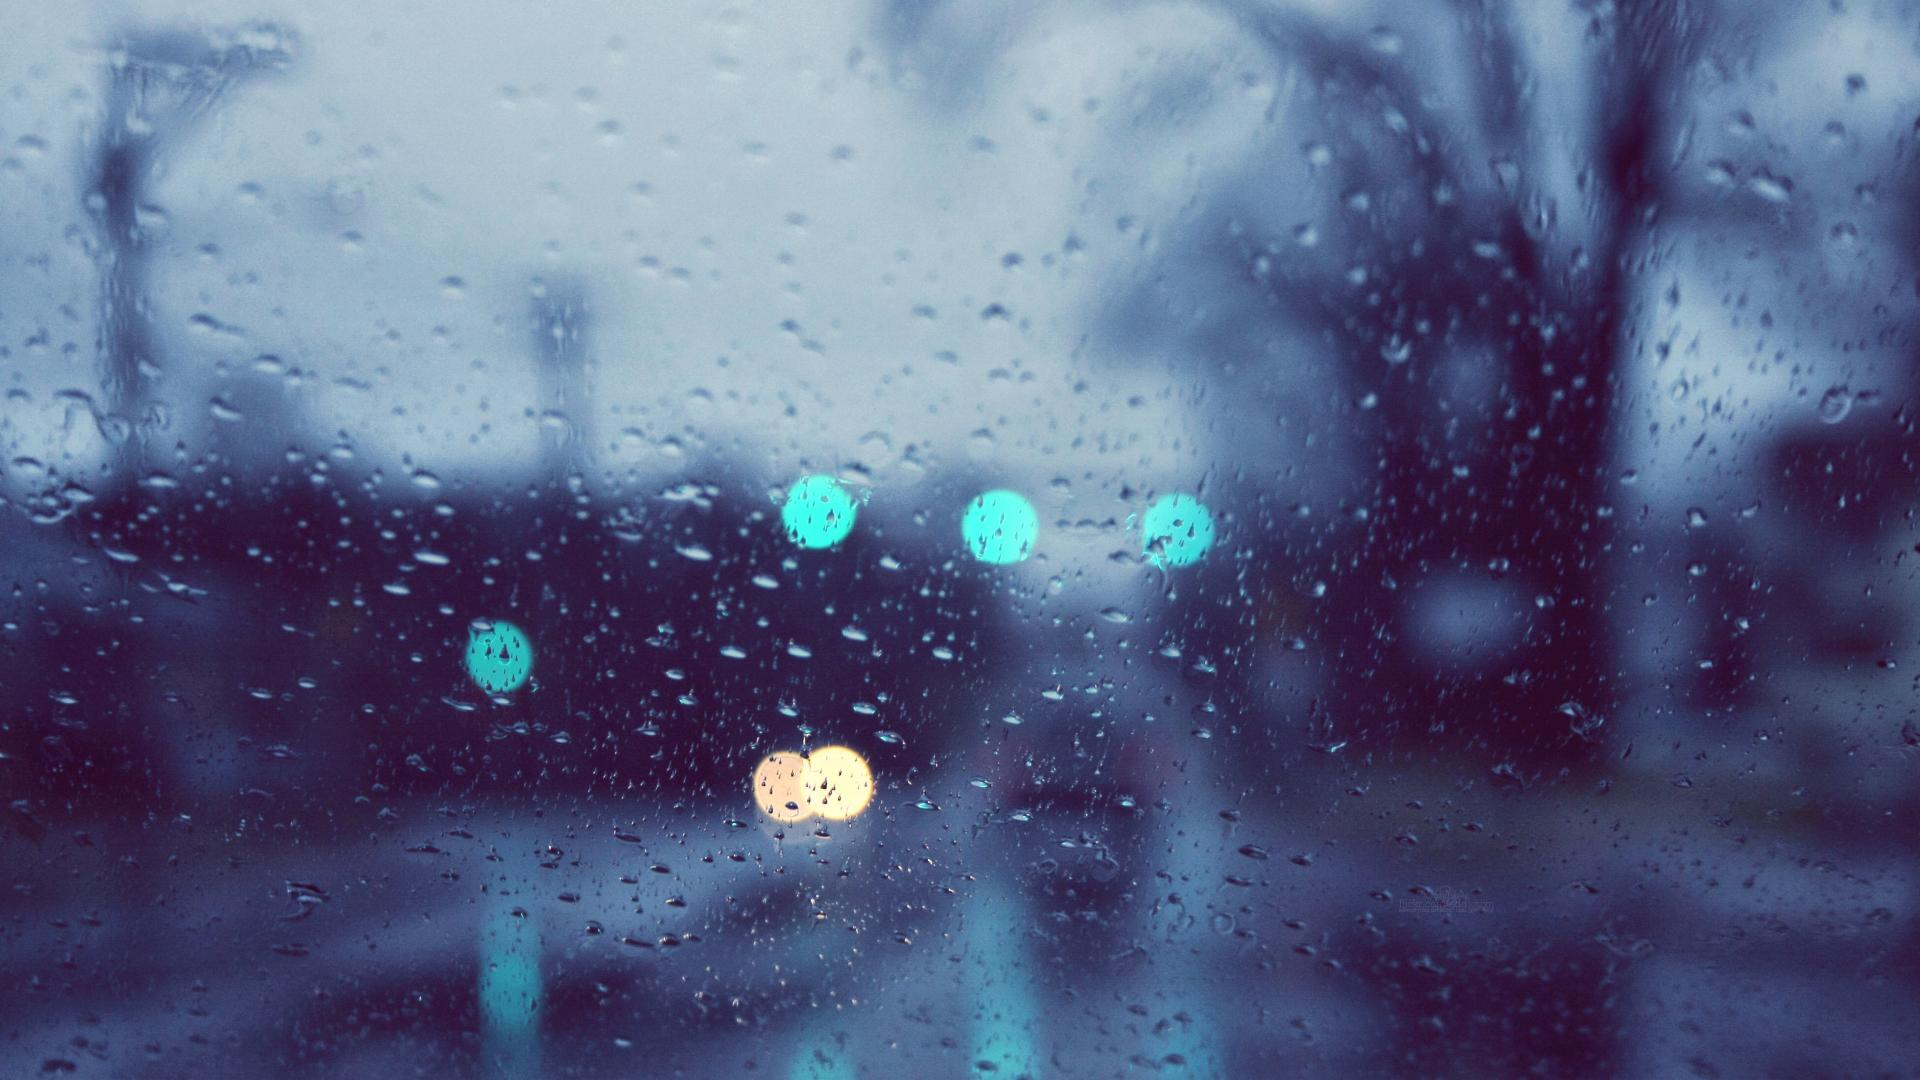 Rain Wallpaper Hd wallpaper   754535 1920x1080